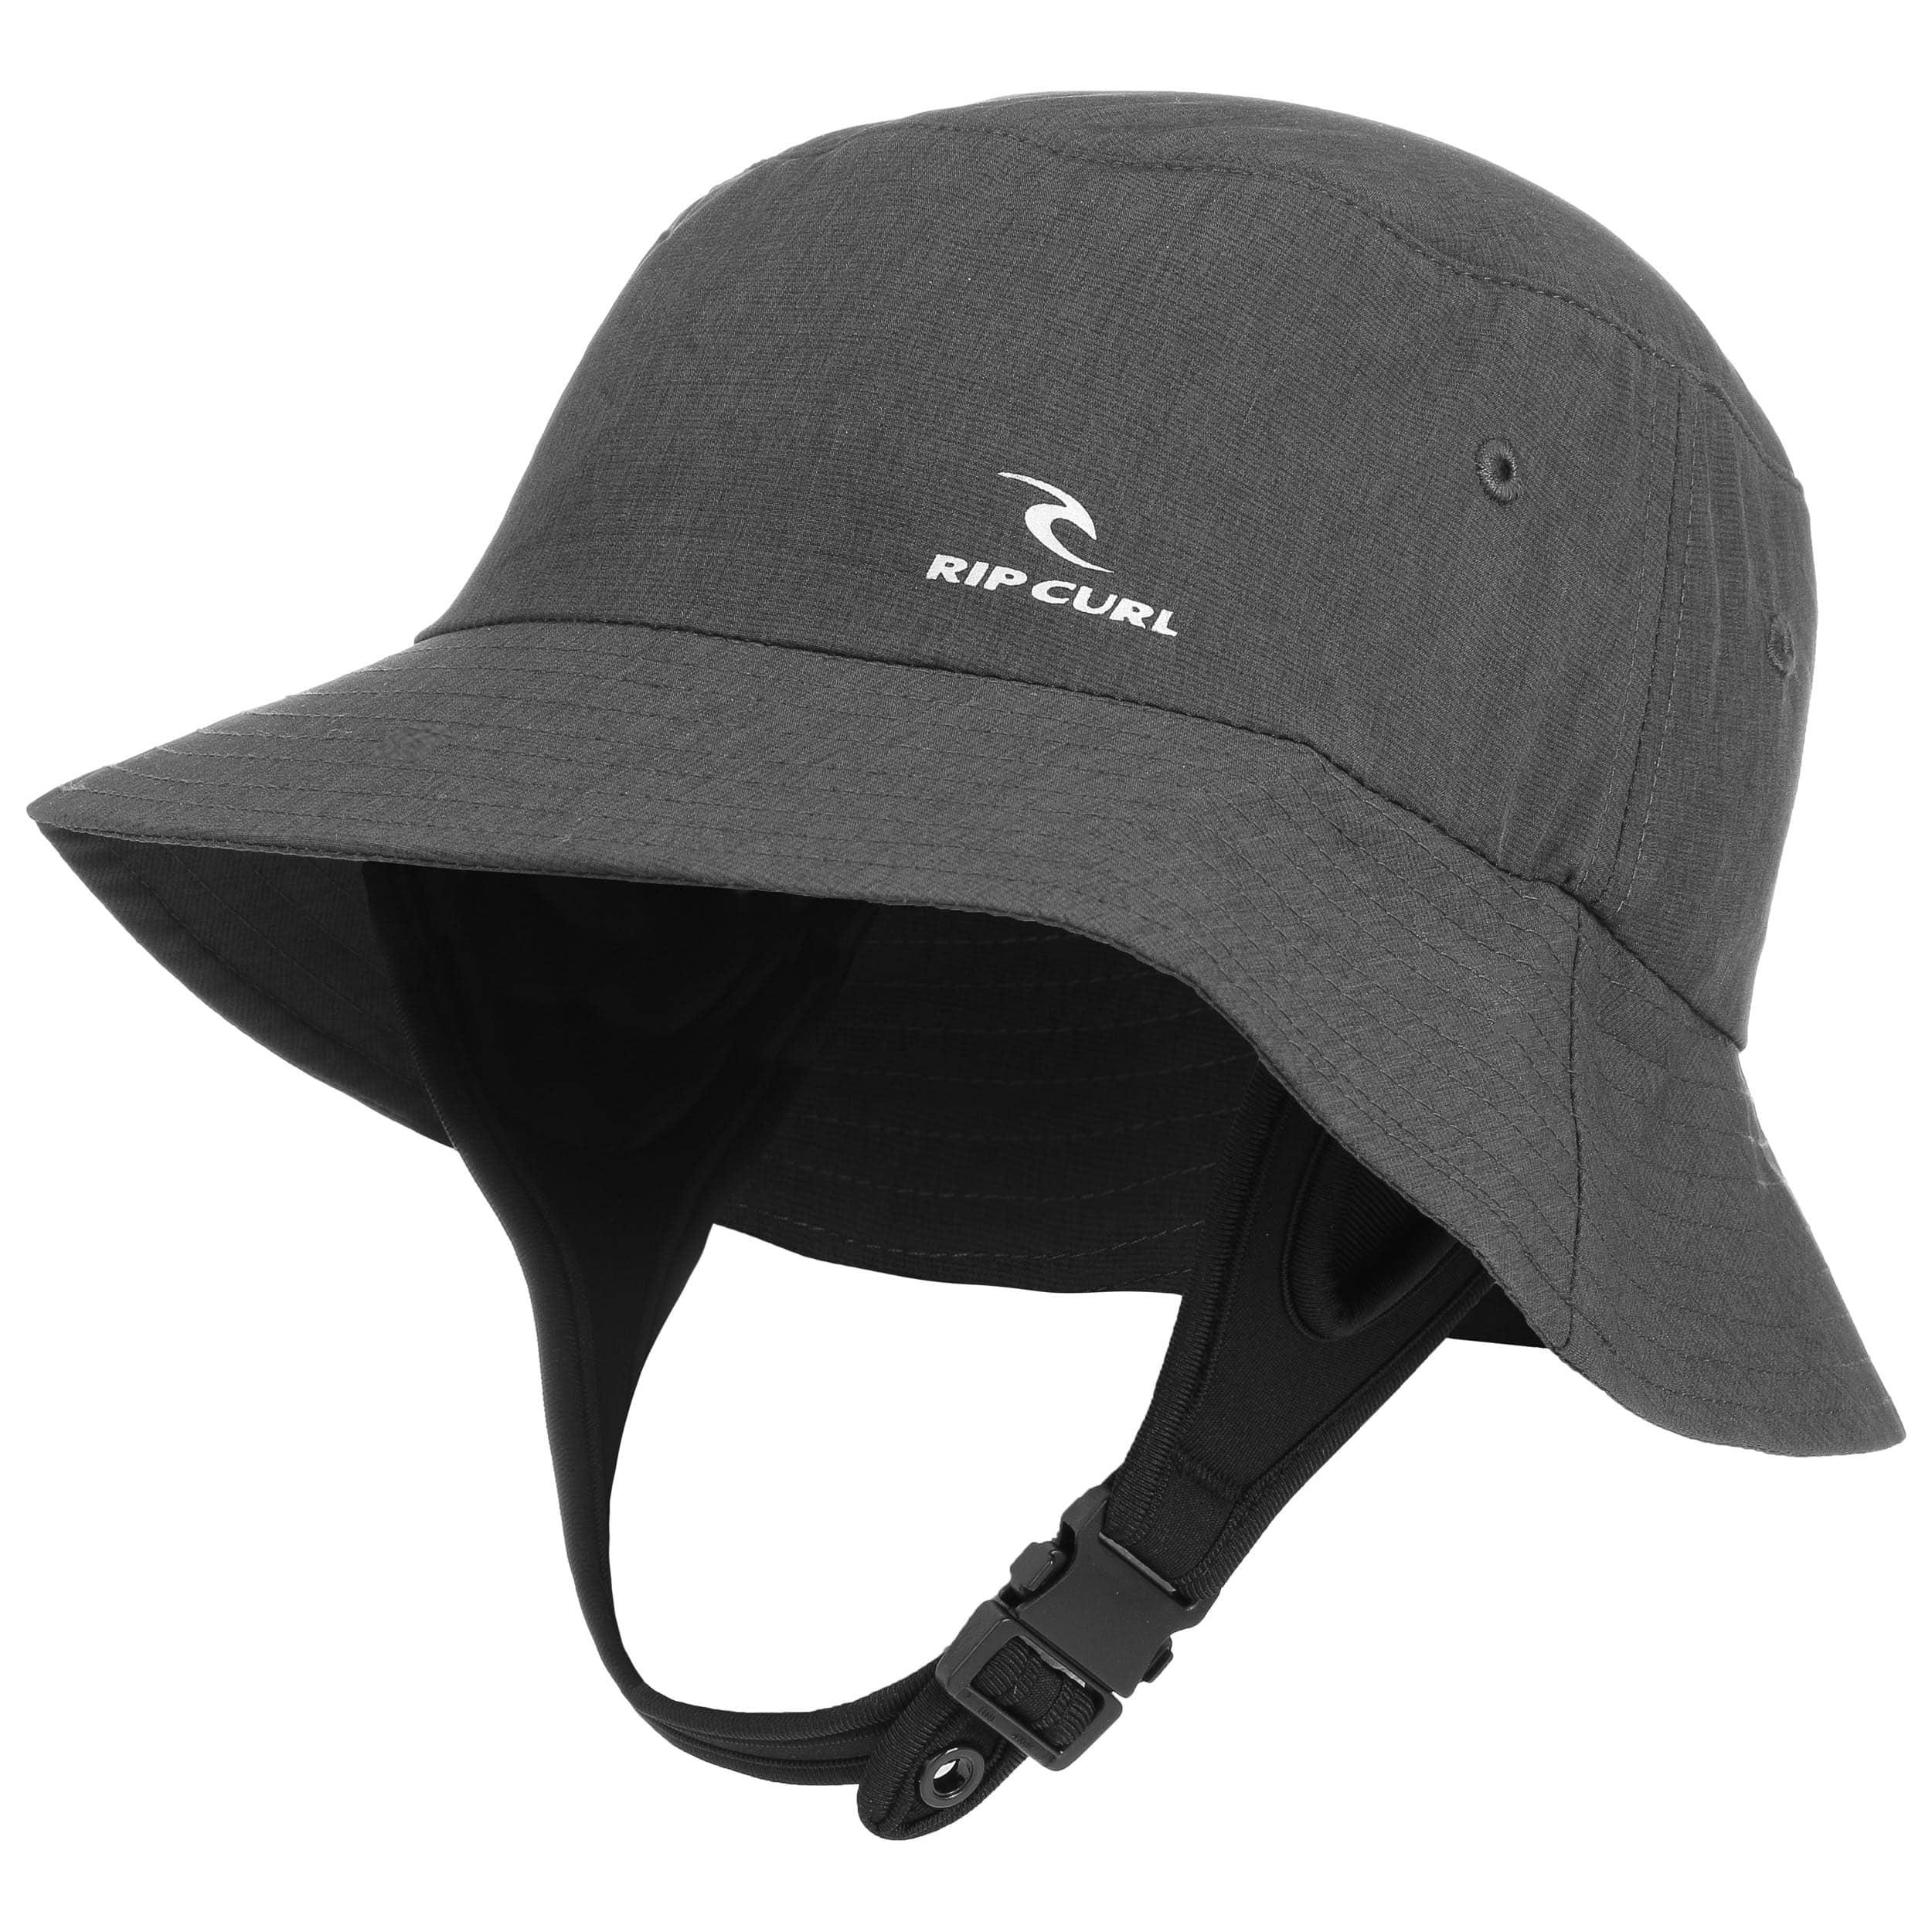 7c1b4d322125f ... Axis Surf Bucket Hat by Rip Curl - black 8